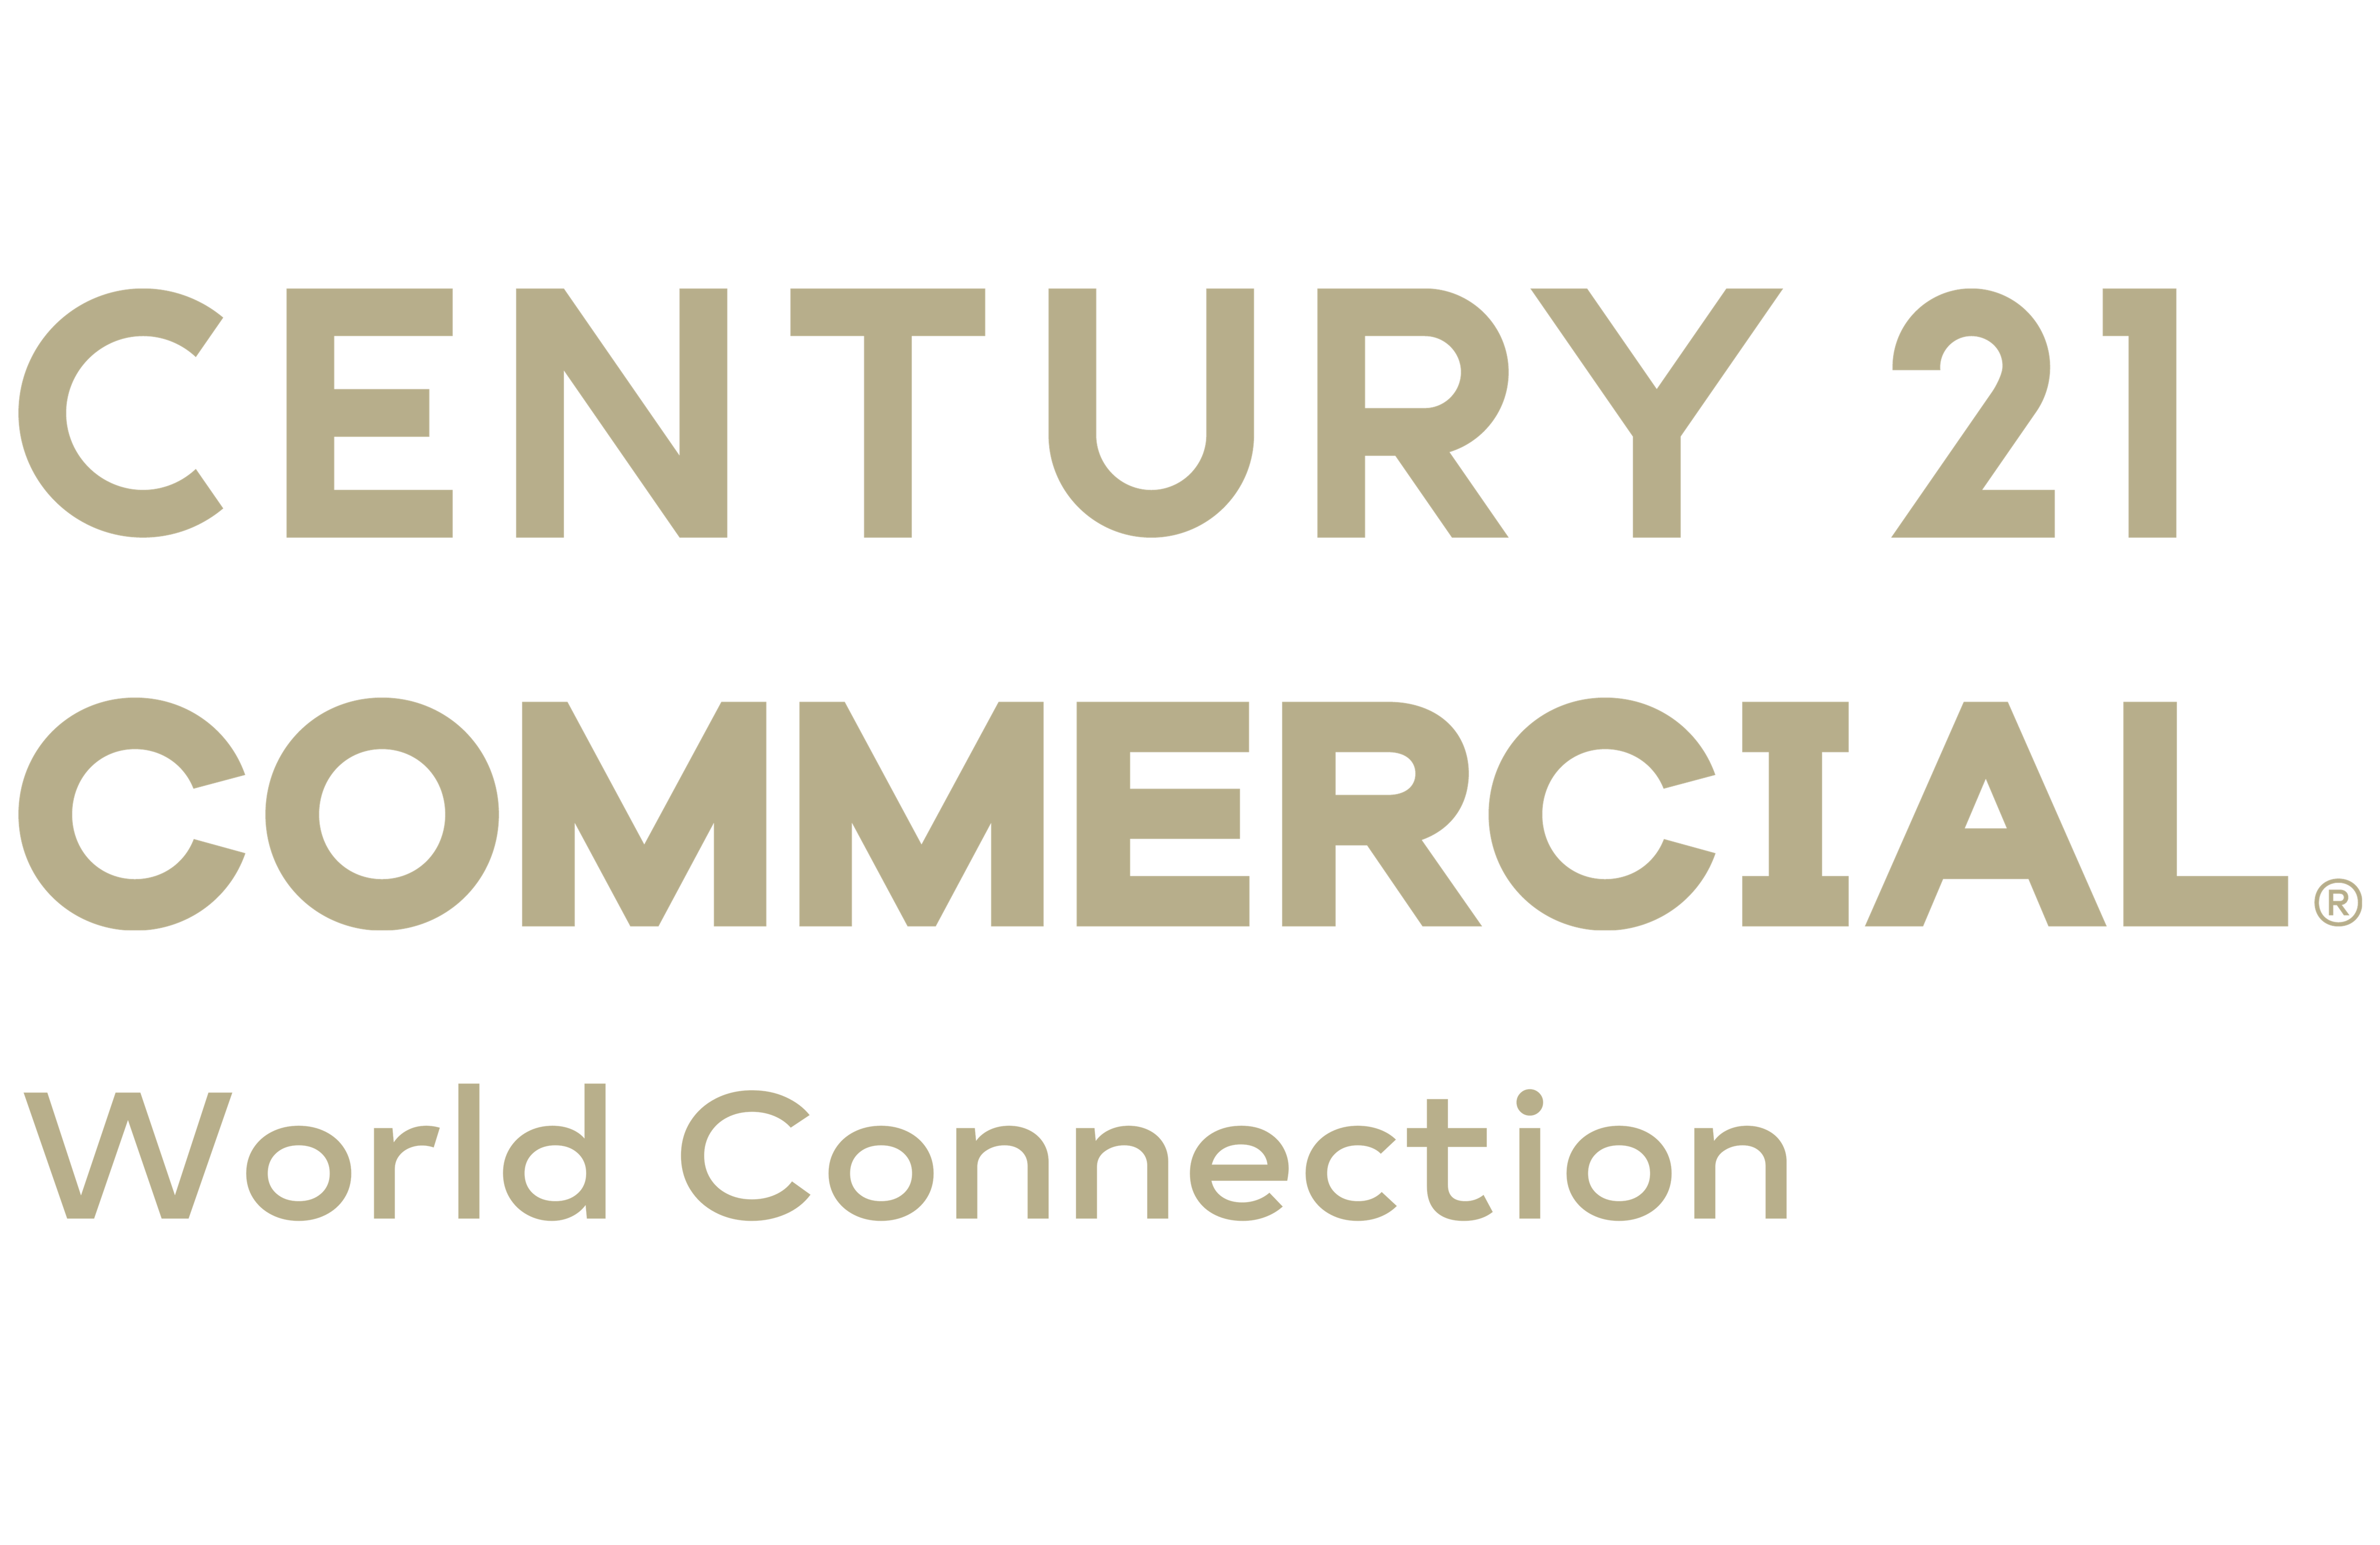 CENTURY 21 World Connection